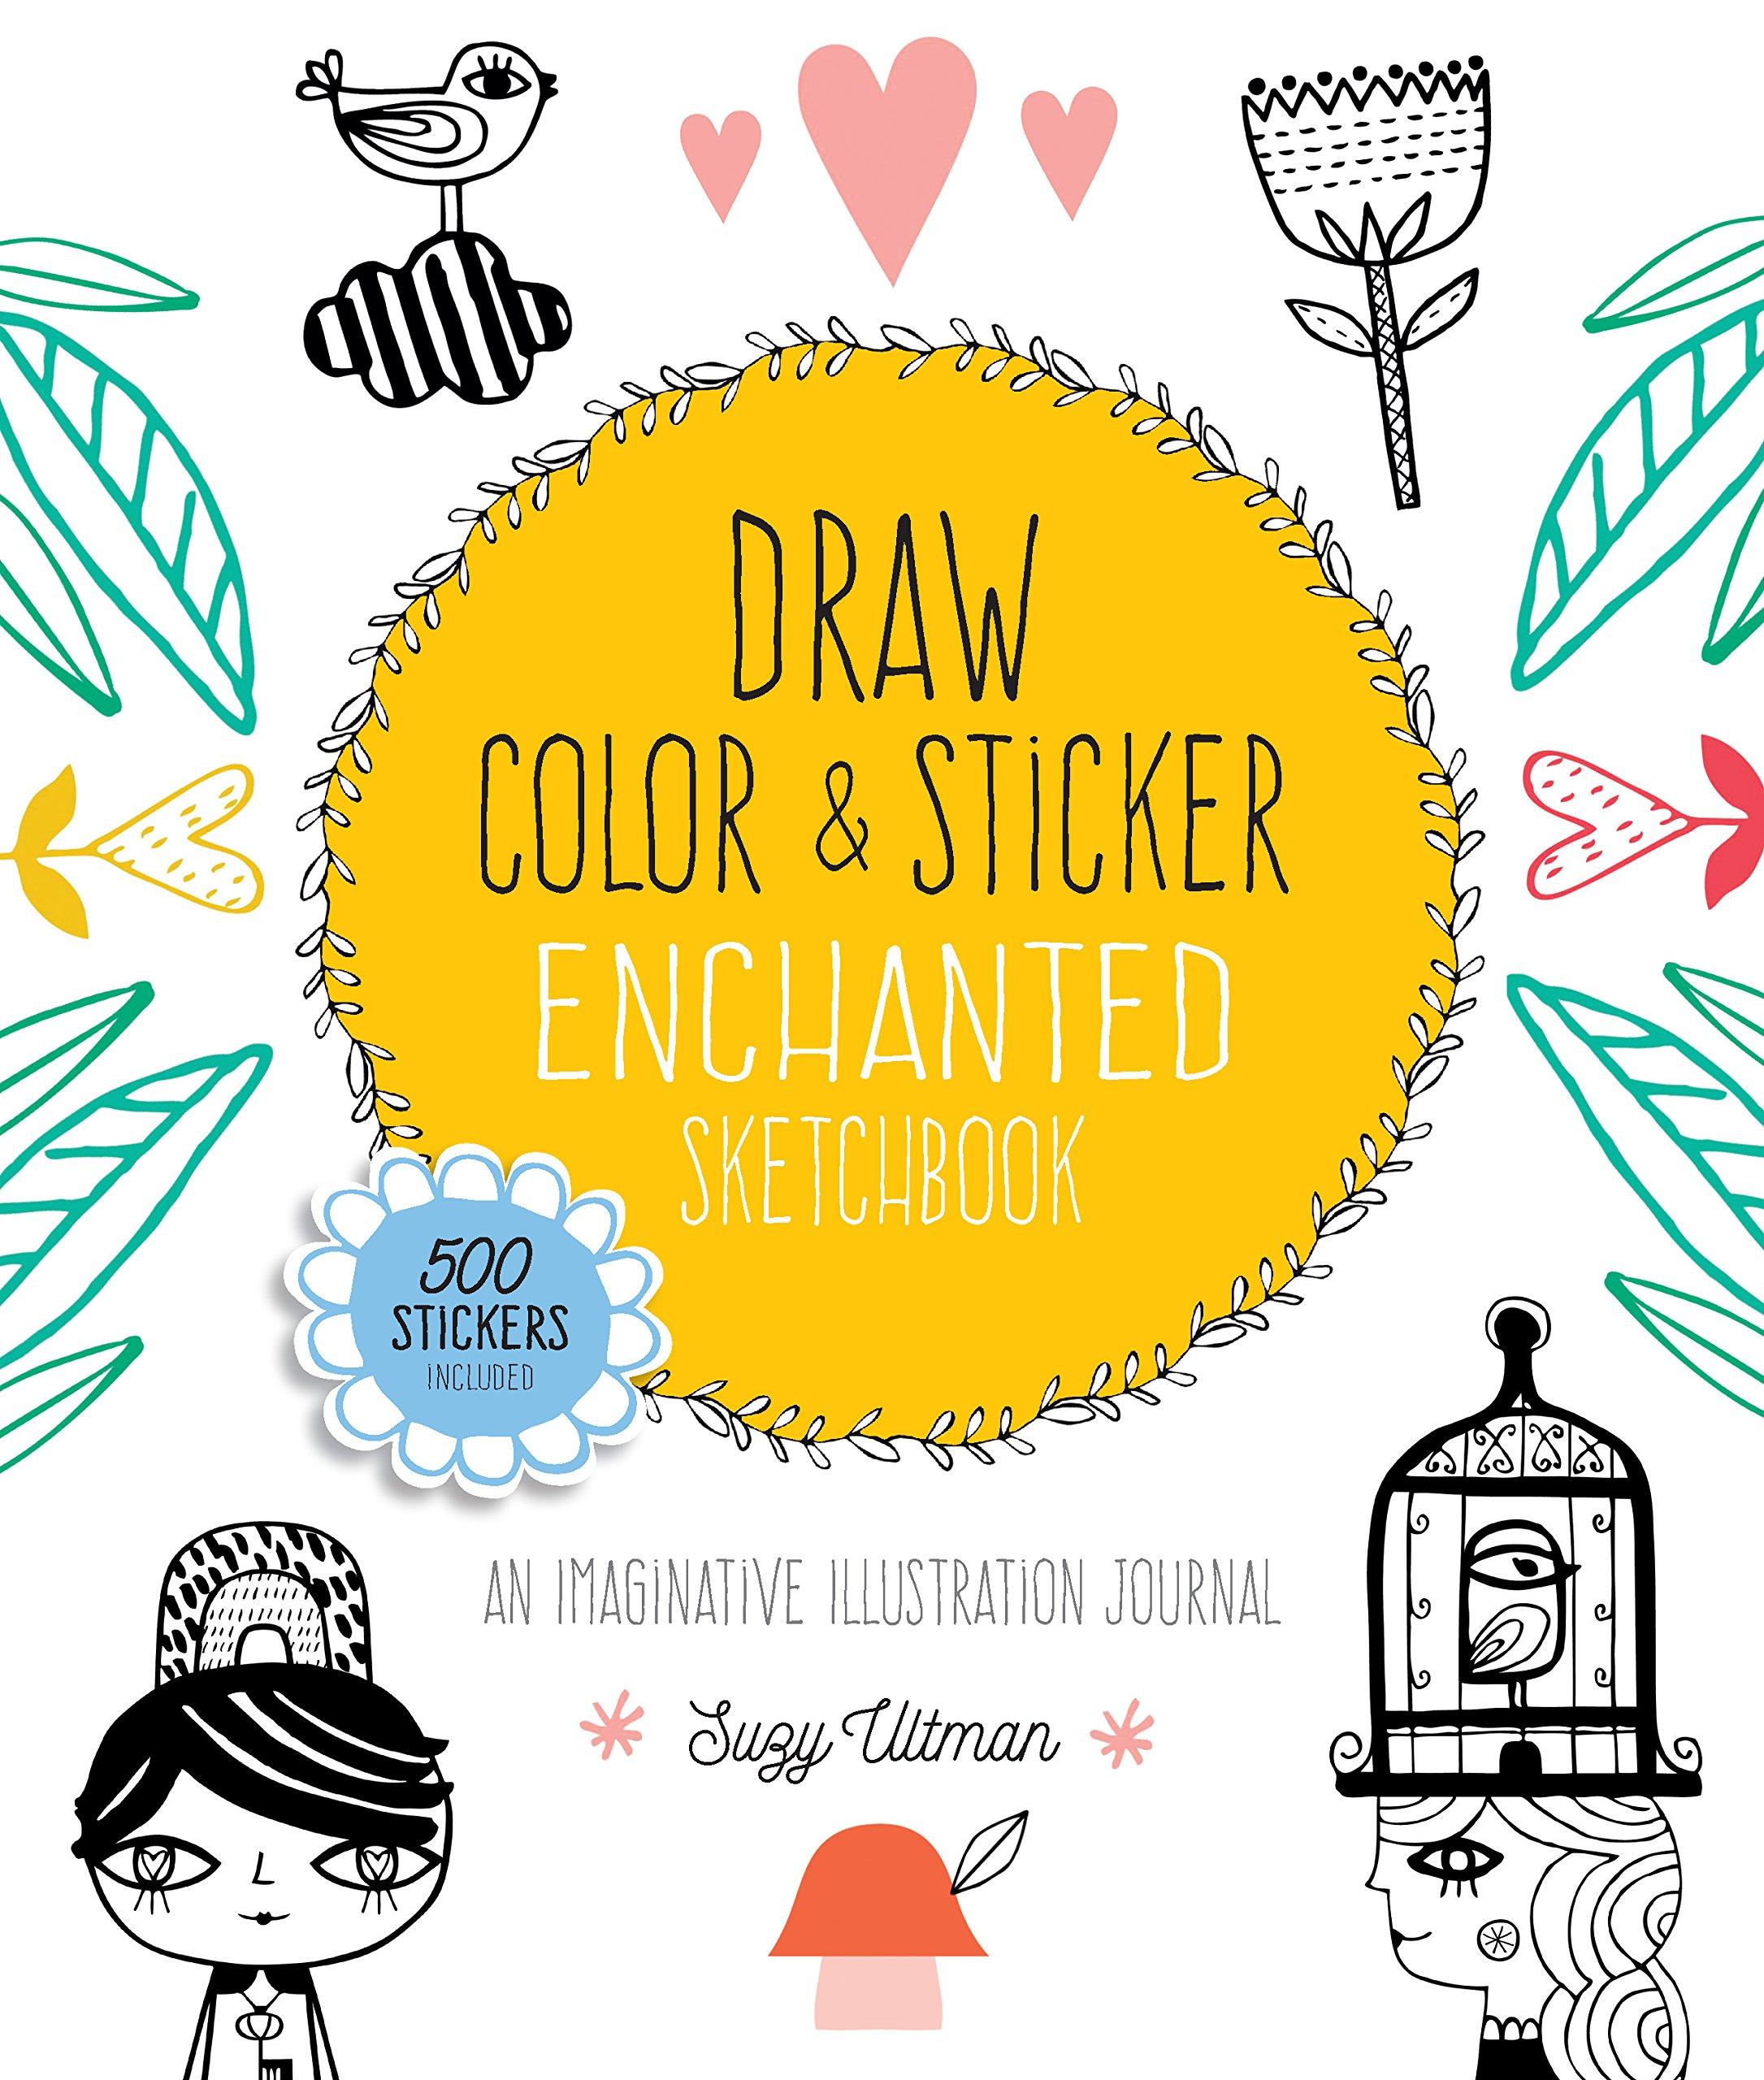 Draw, Color, and Sticker Enchanted Sketchbook: An Imaginative Illustration Journal pdf